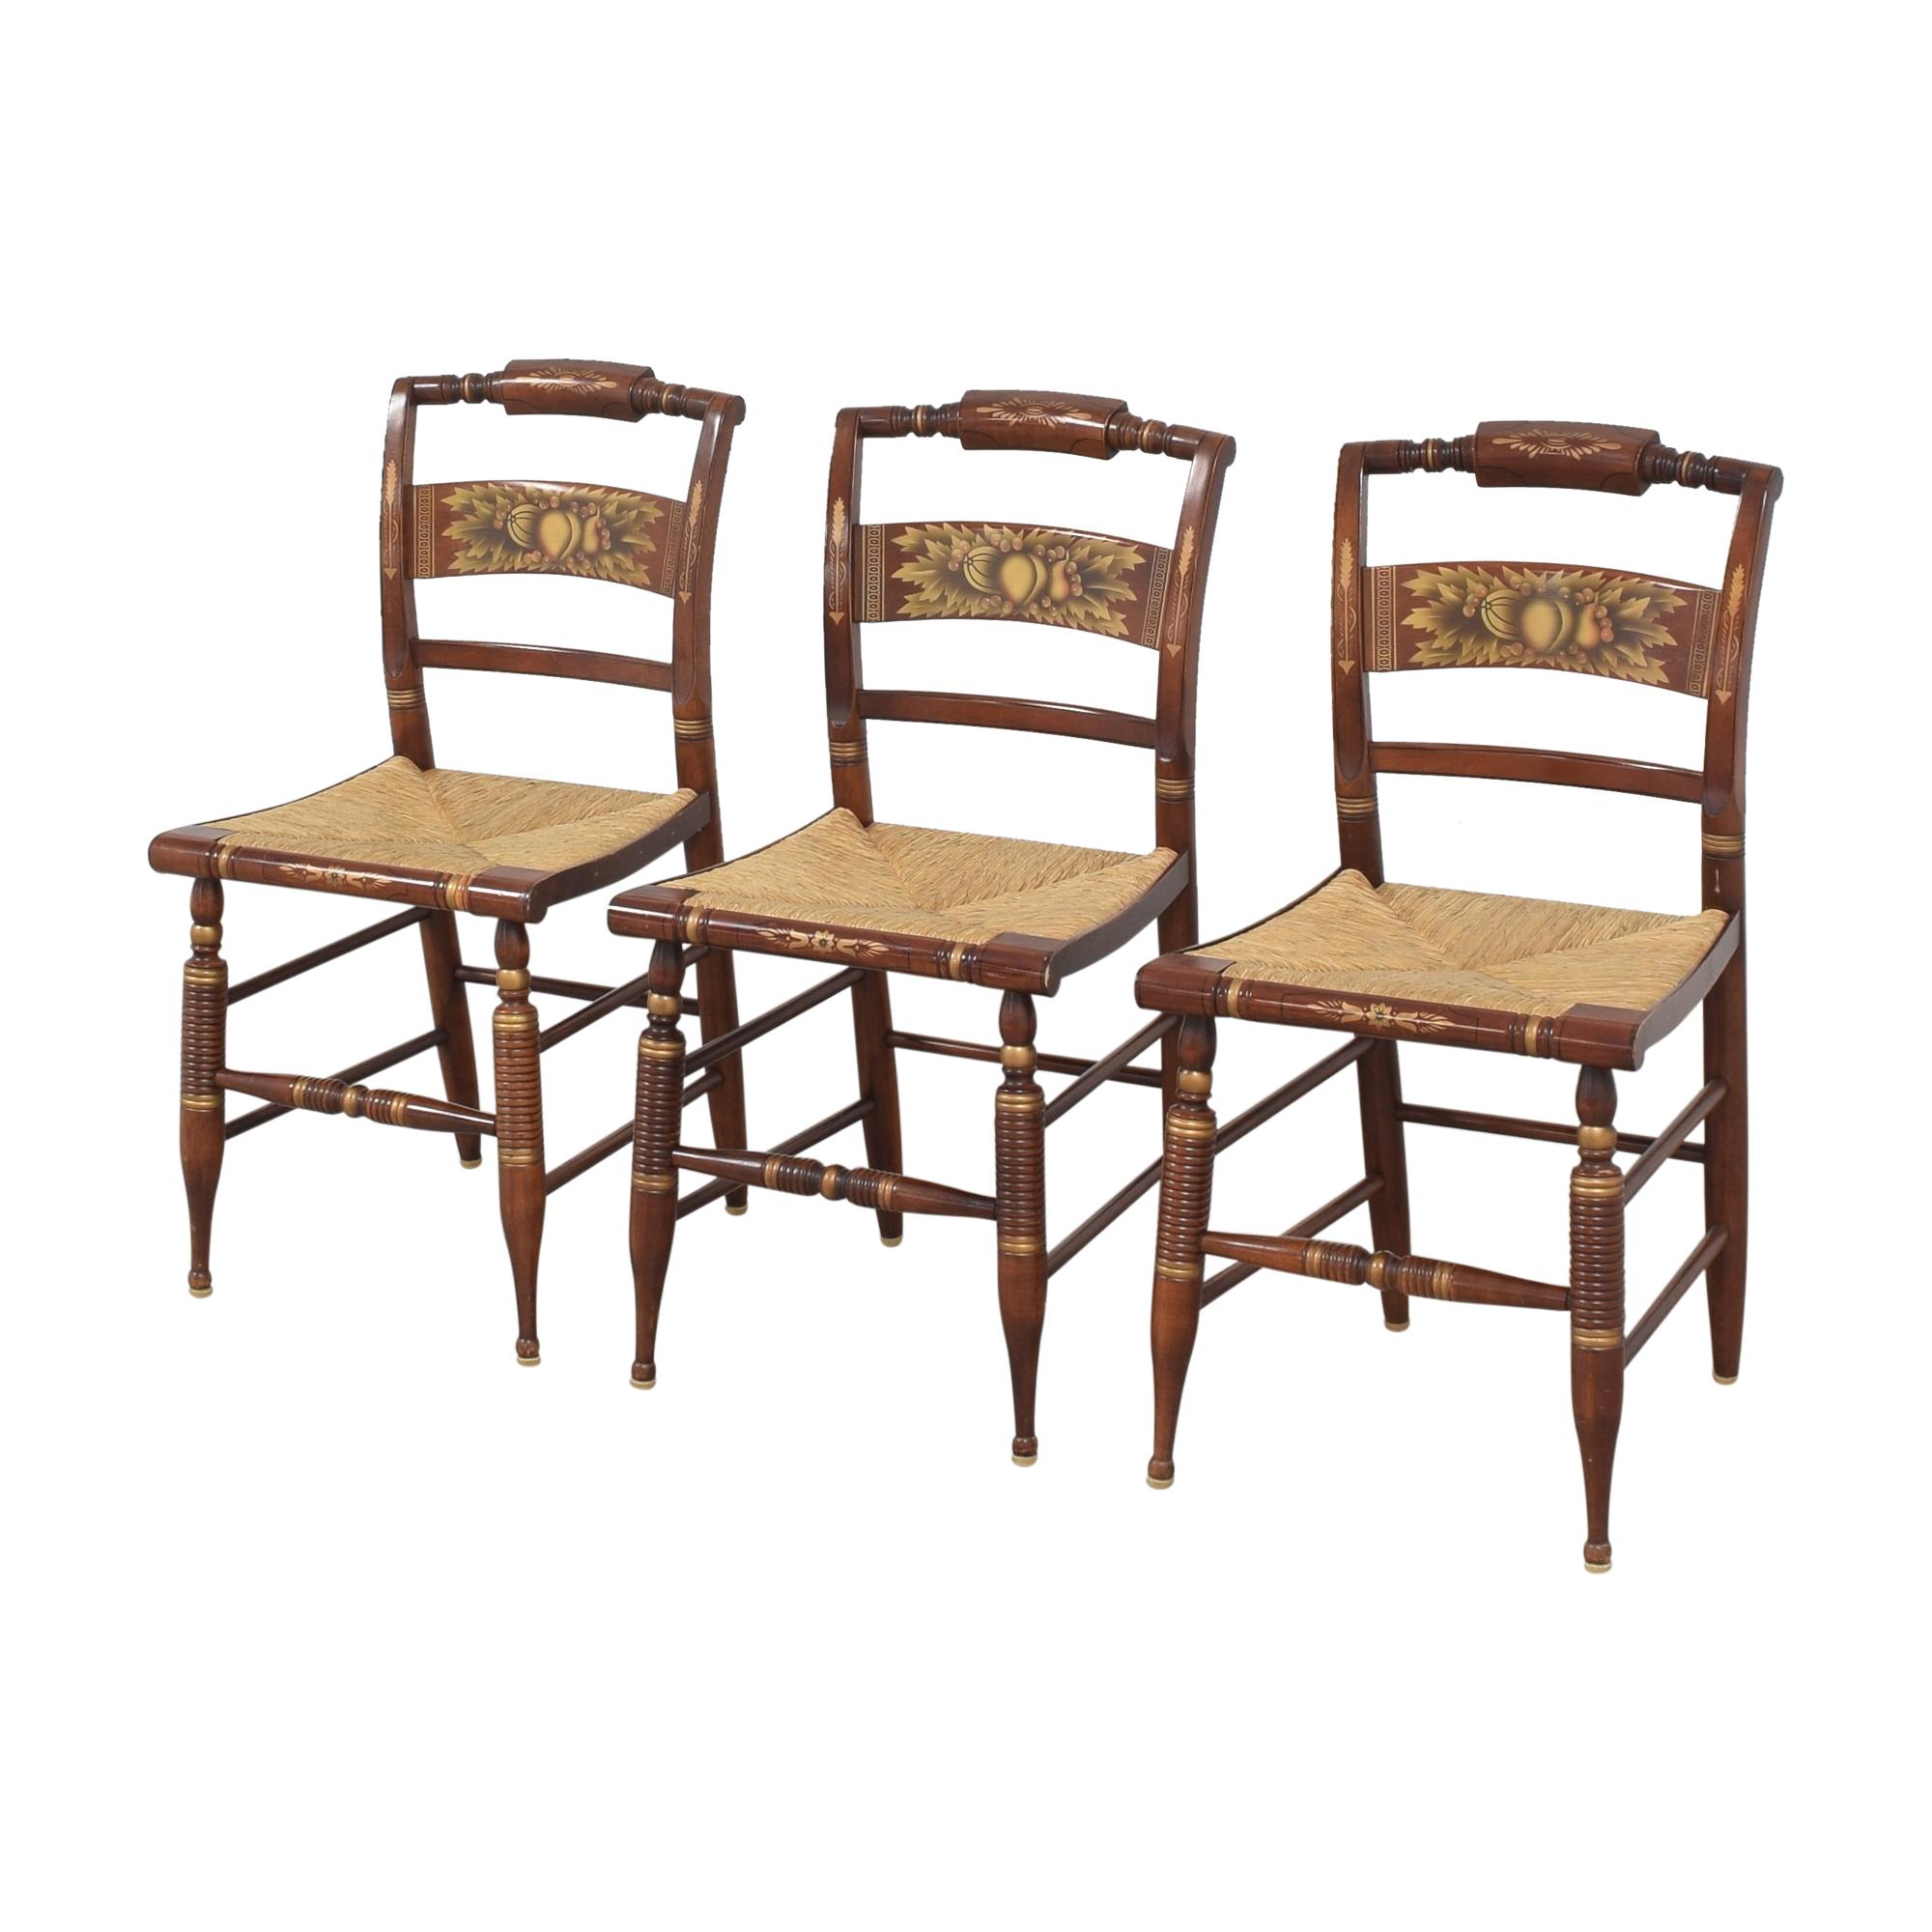 Lambert Hitchcock Lambert Hitchcock Cane Seat Dining Chairs used